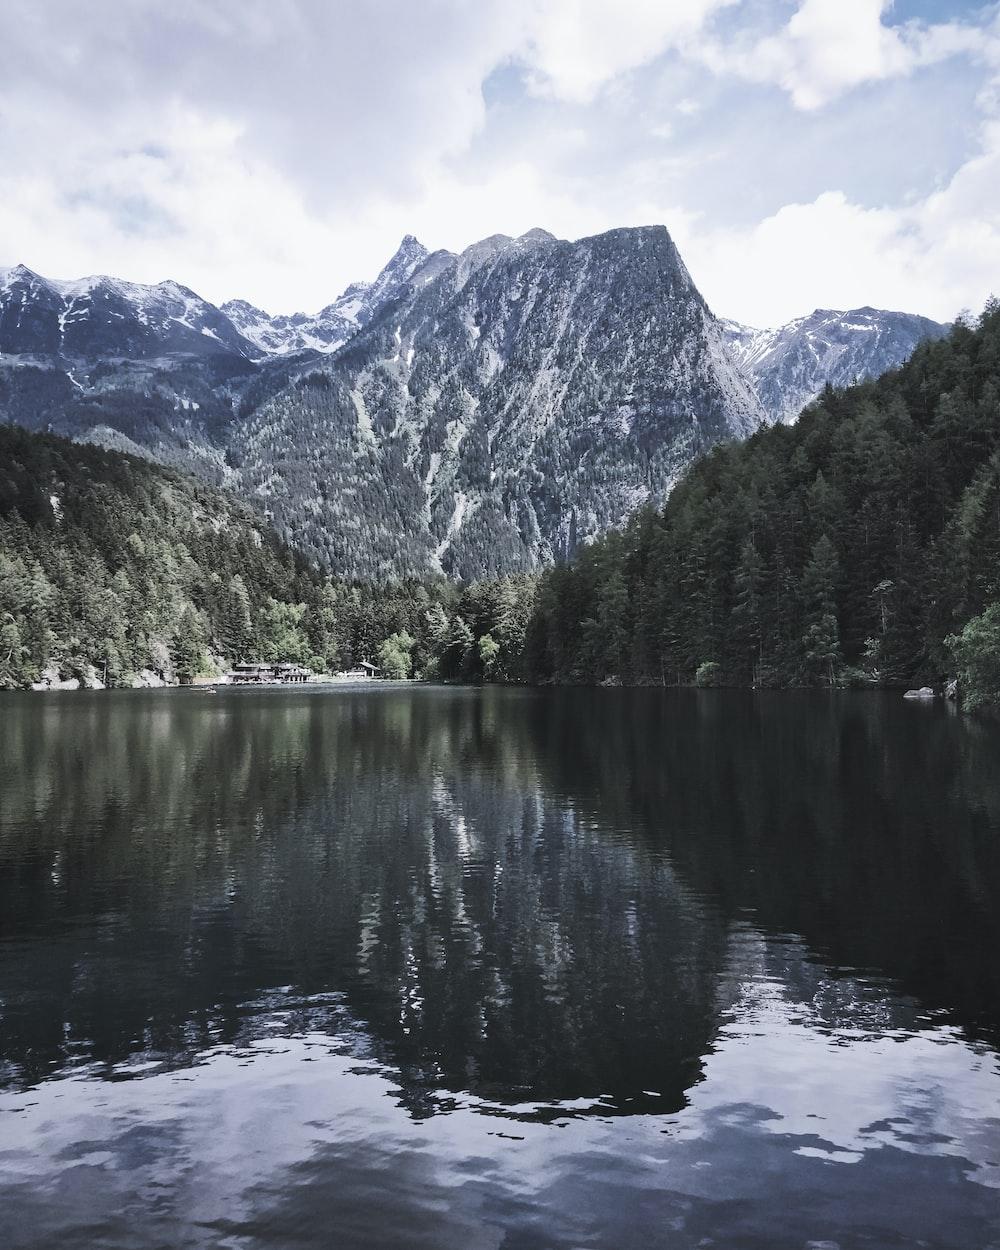 rippling body of water near trees